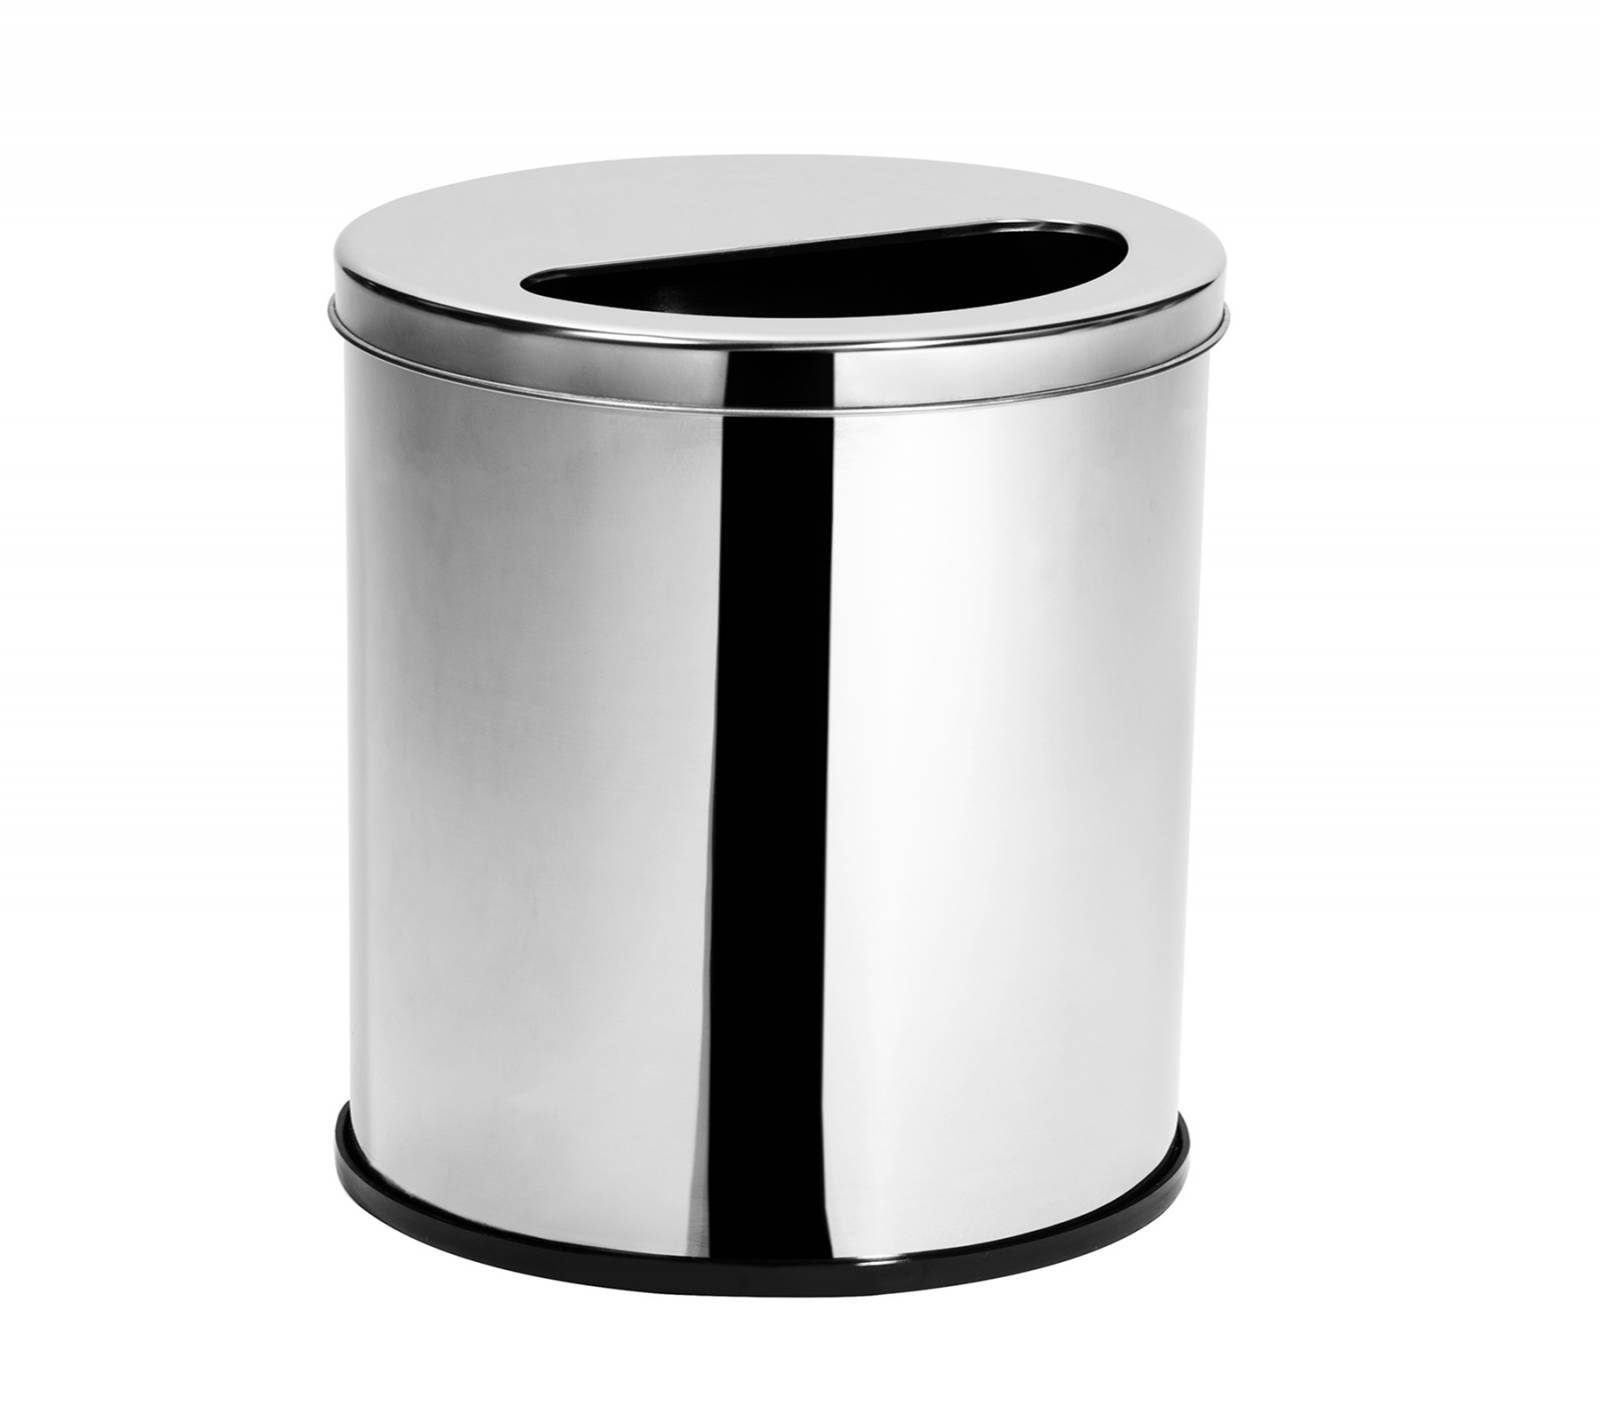 Lixeira Inox c/ tampa 1/2 Lua 6,9 Litros - Elegance